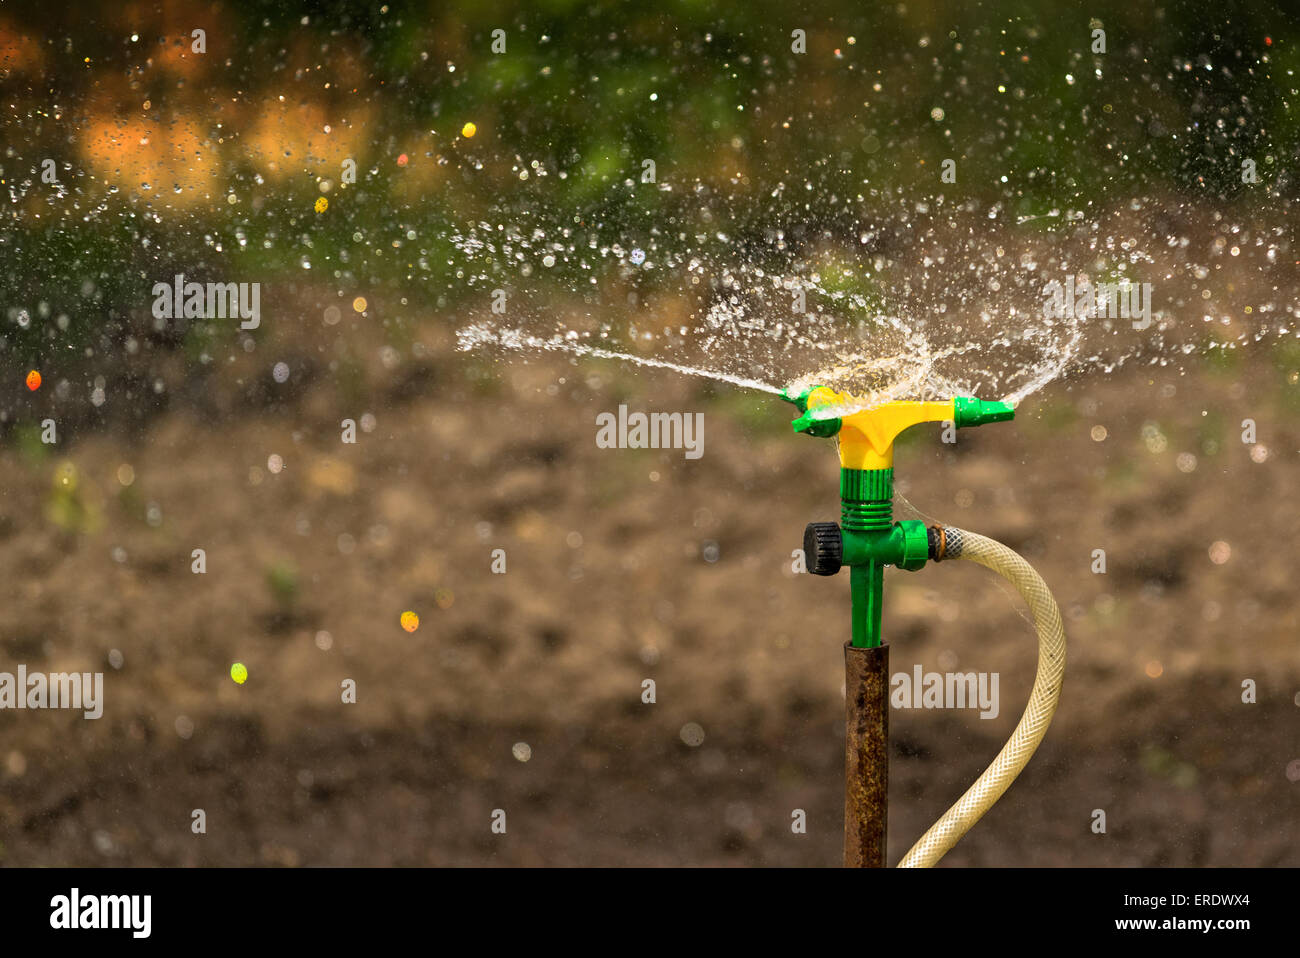 Plastic Home Gardening Irrigation Sprinkler in Operation on Stock ...